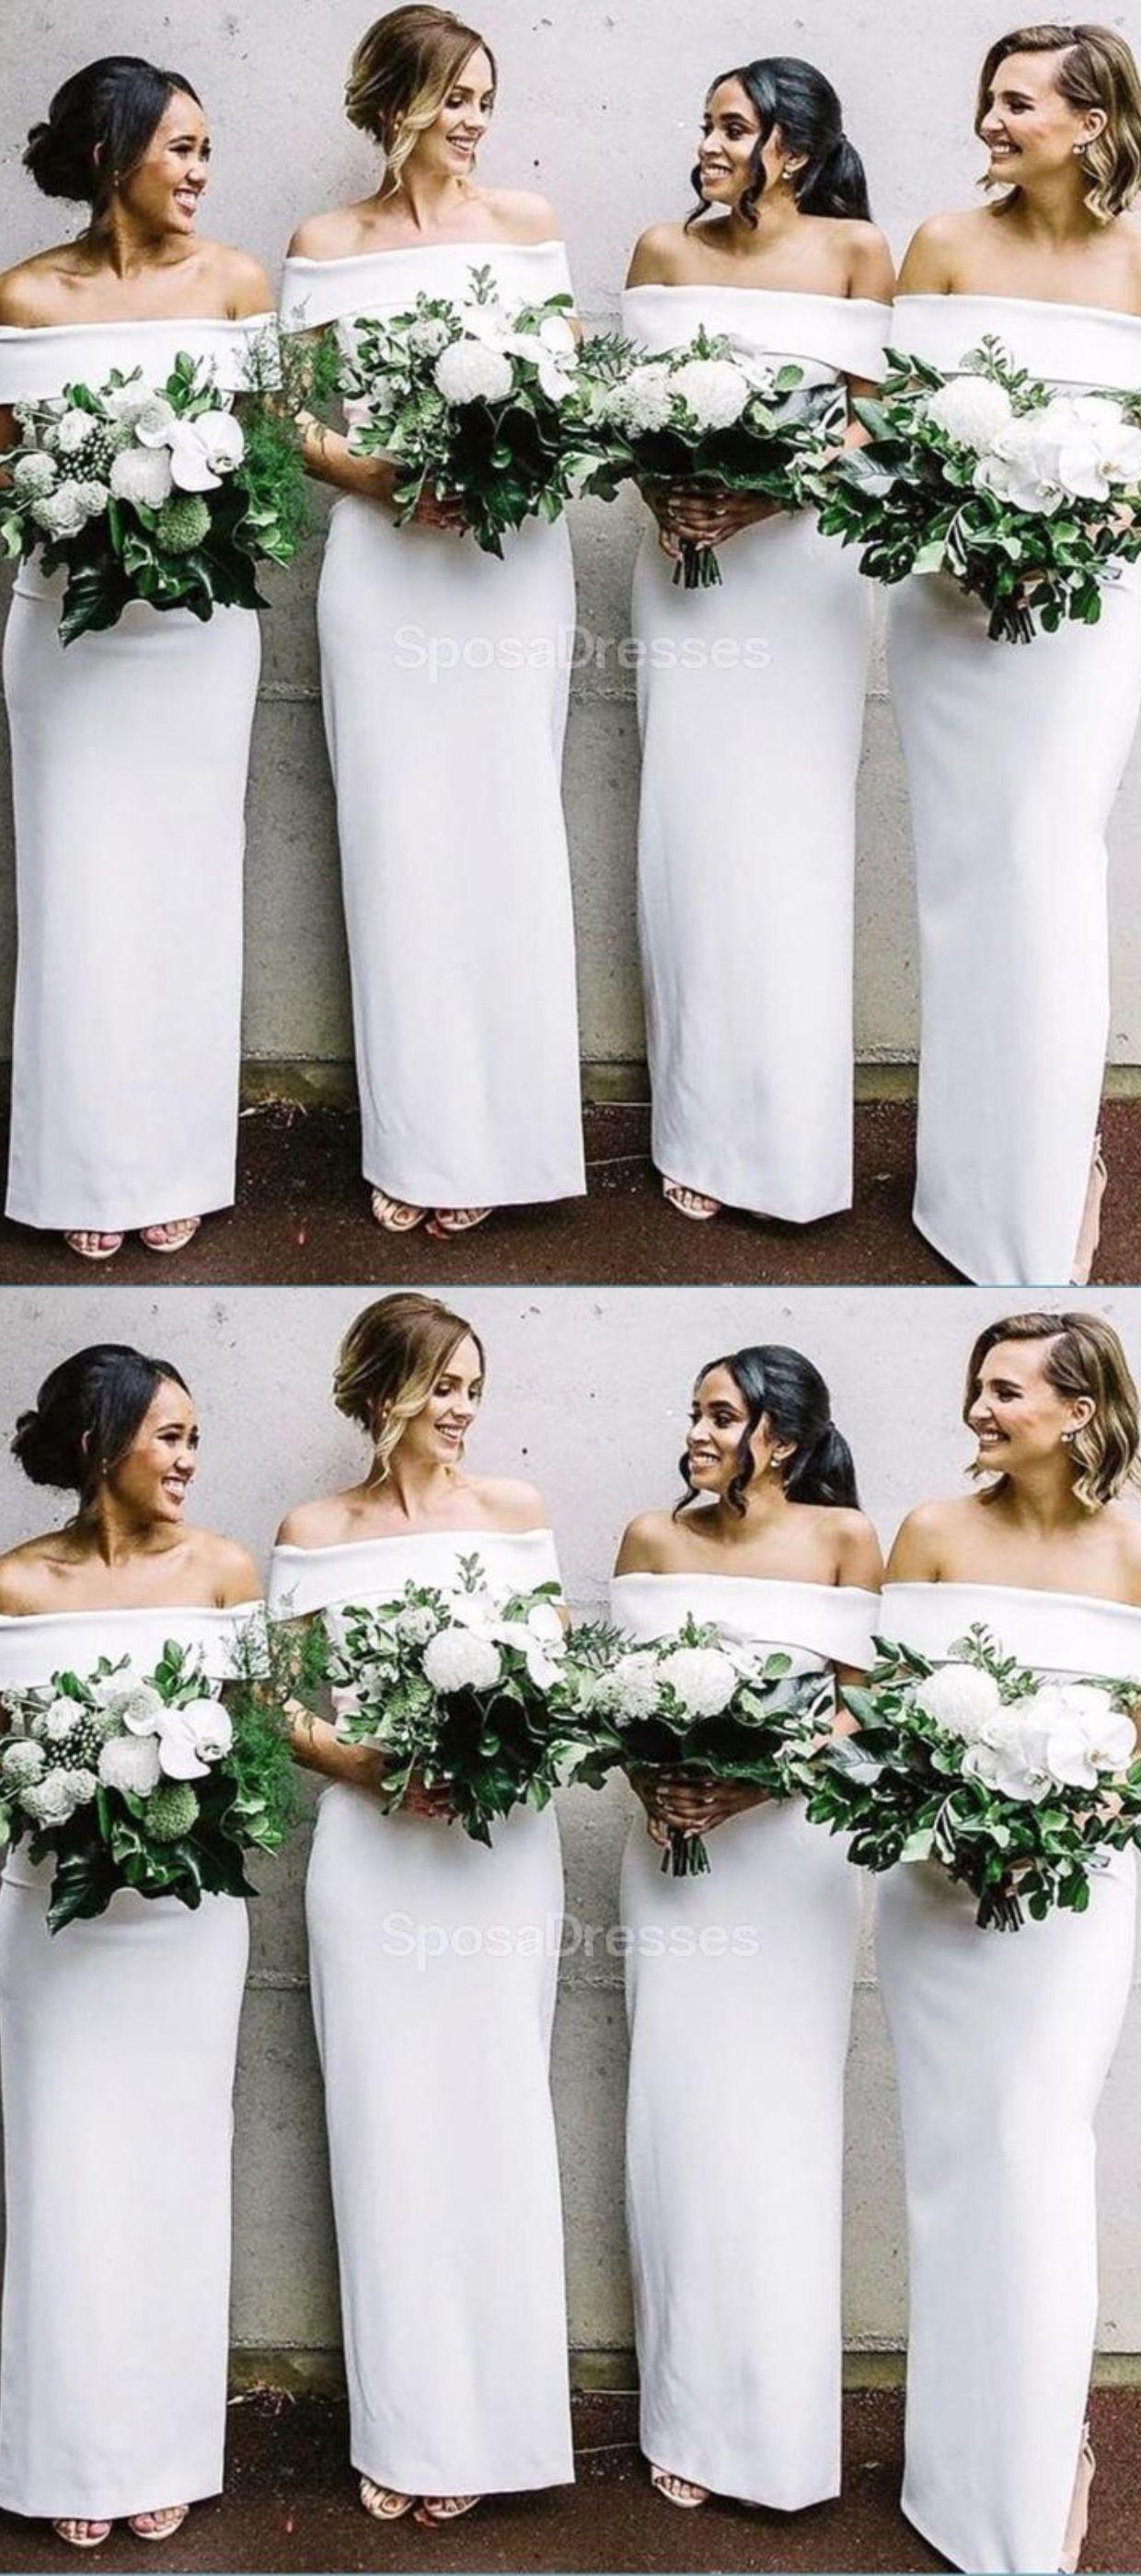 Off White Mermaid Long Bridesmaid Dresses Online In 2020 Off Shoulder Bridesmaid Dress White Bridesmaid Dresses Long Simple Bridesmaid Dresses